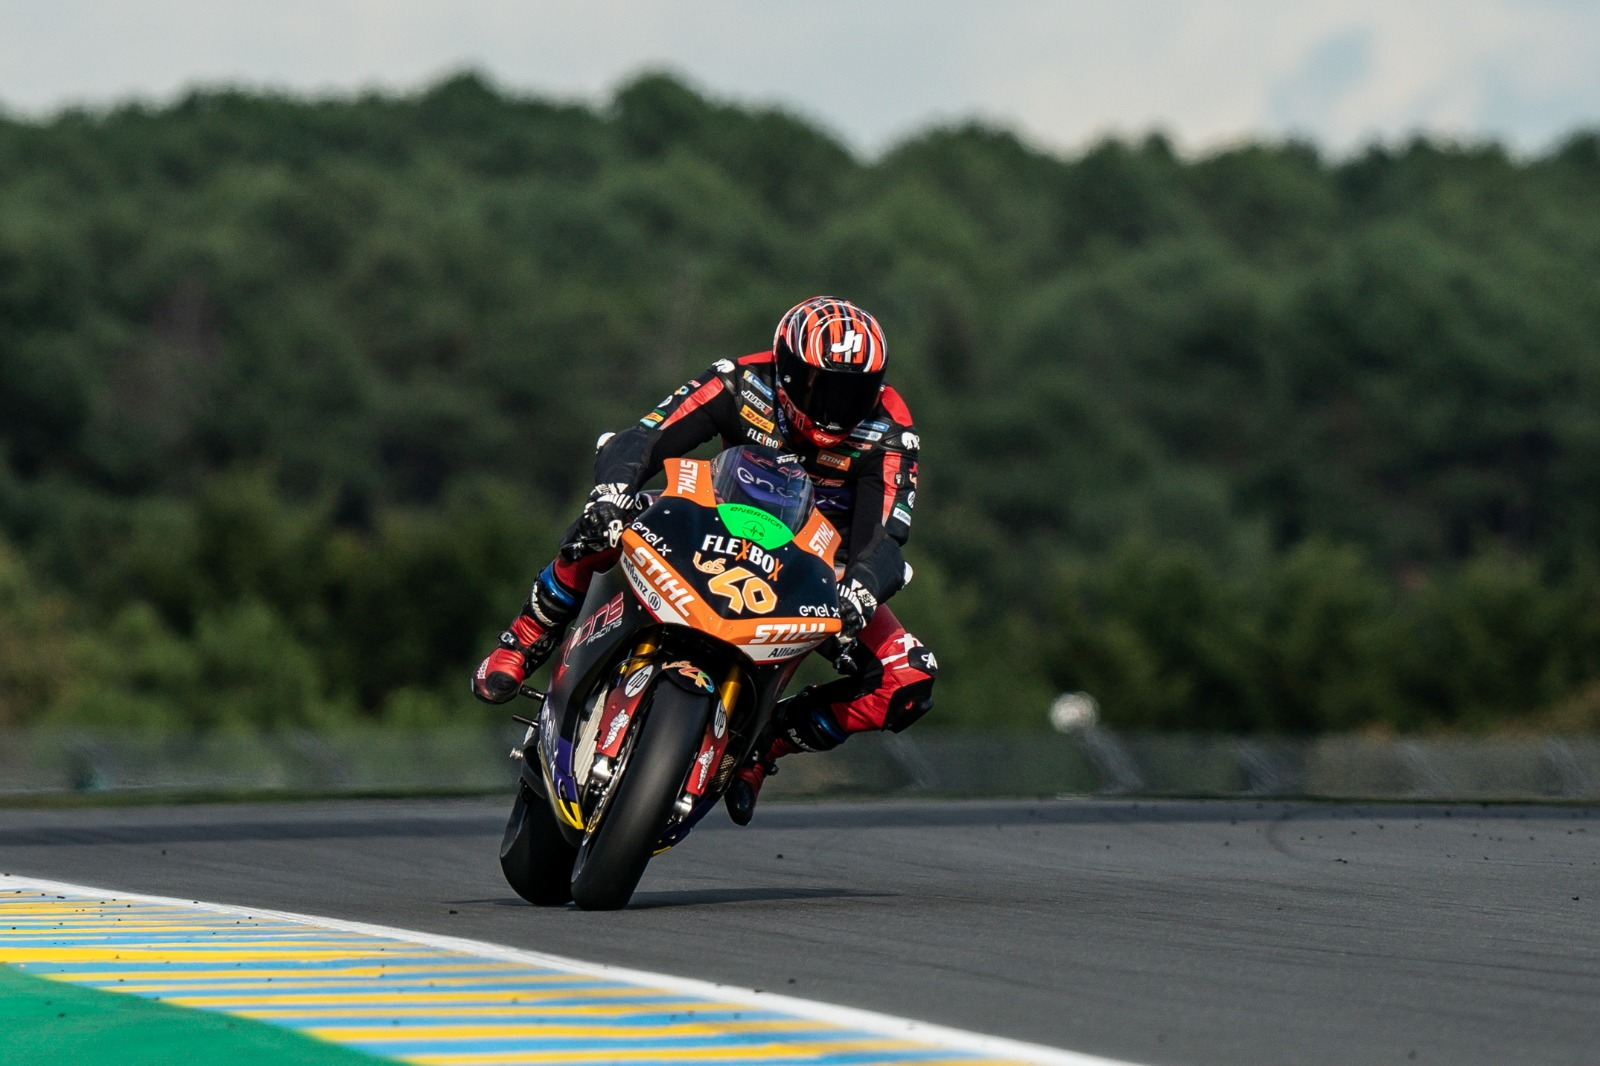 Jordi Torres se alza como campeón de MotoE con victoria de Niki Tuuli